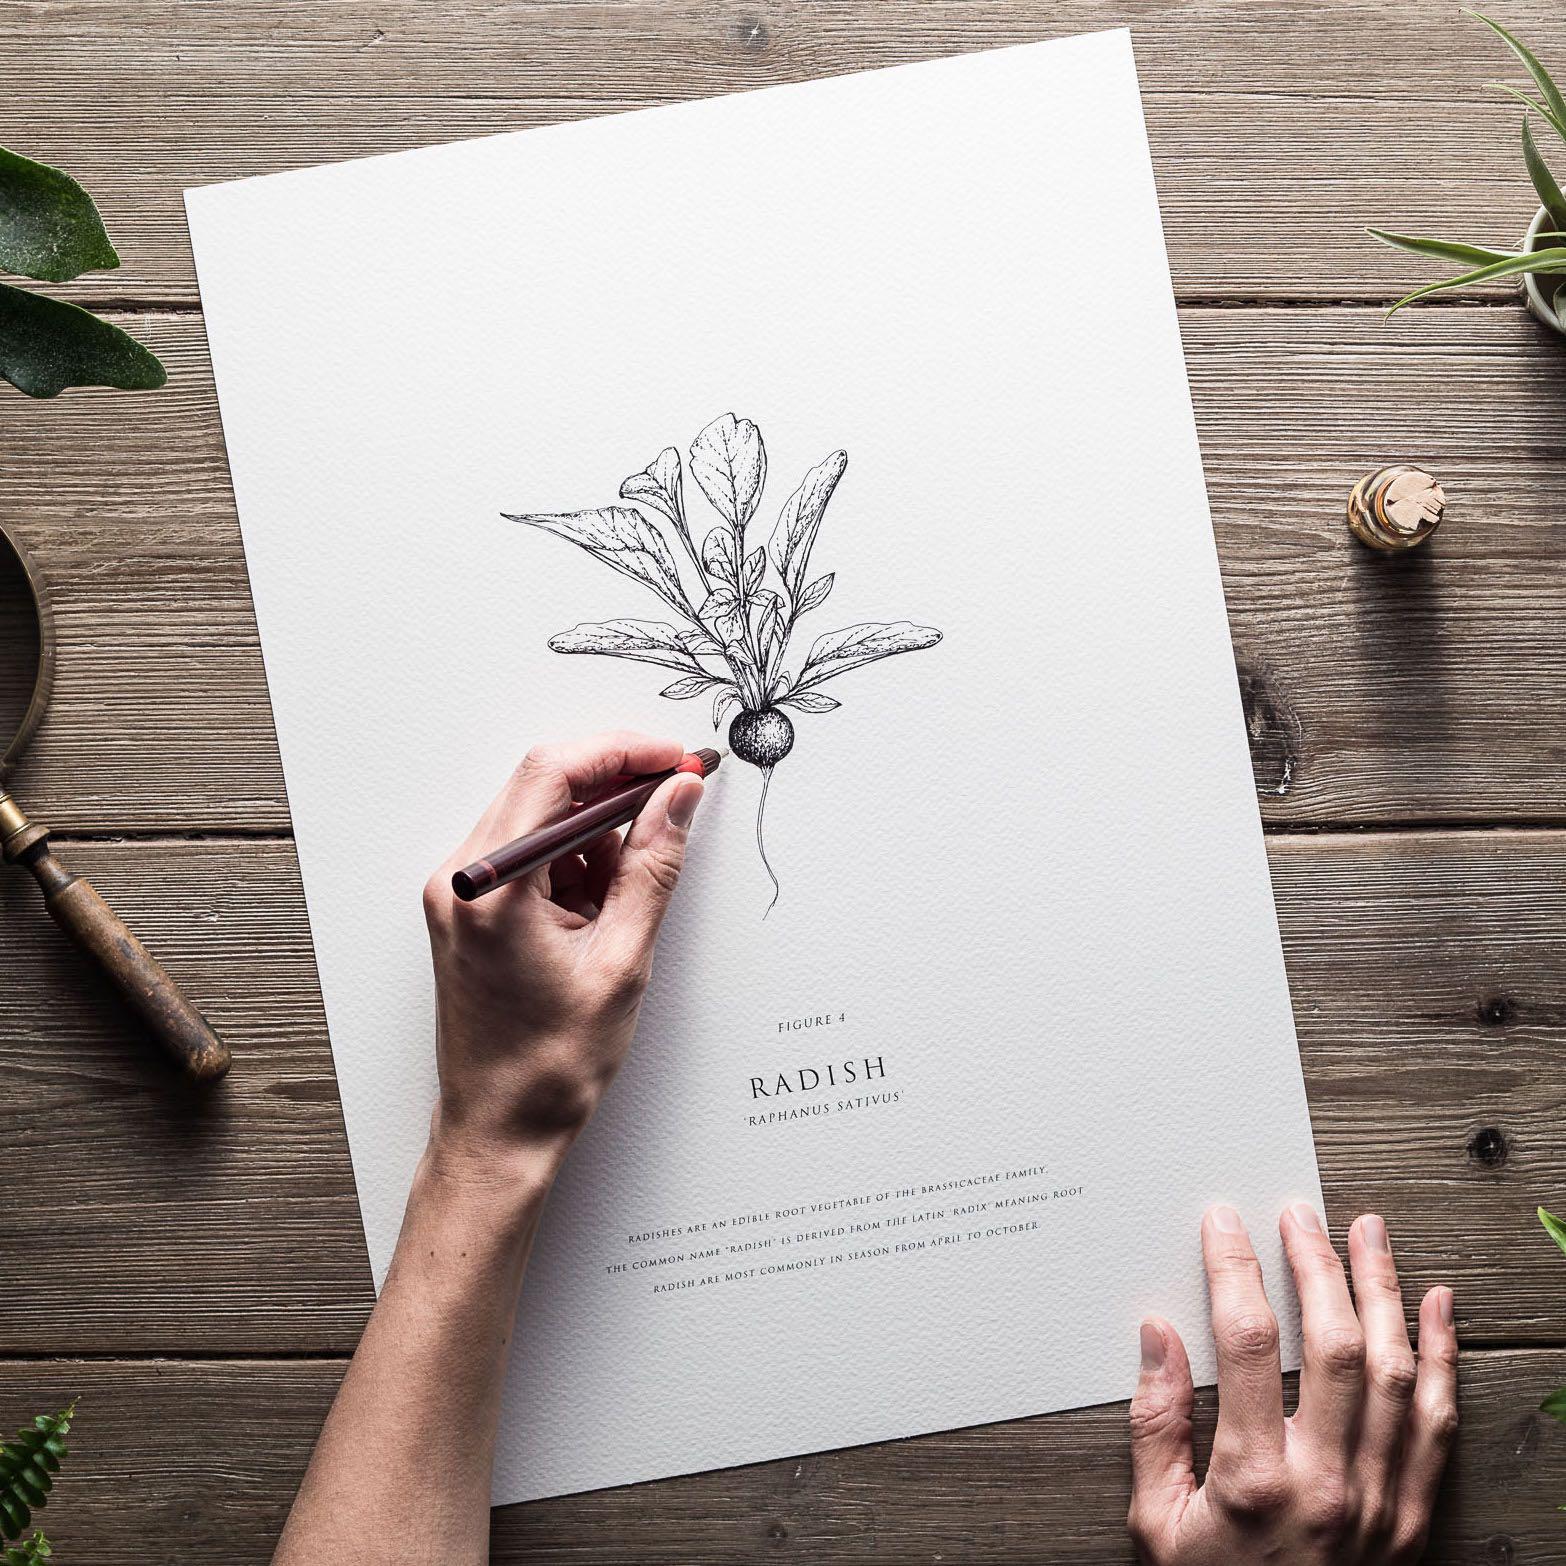 Radish | Being Drawn